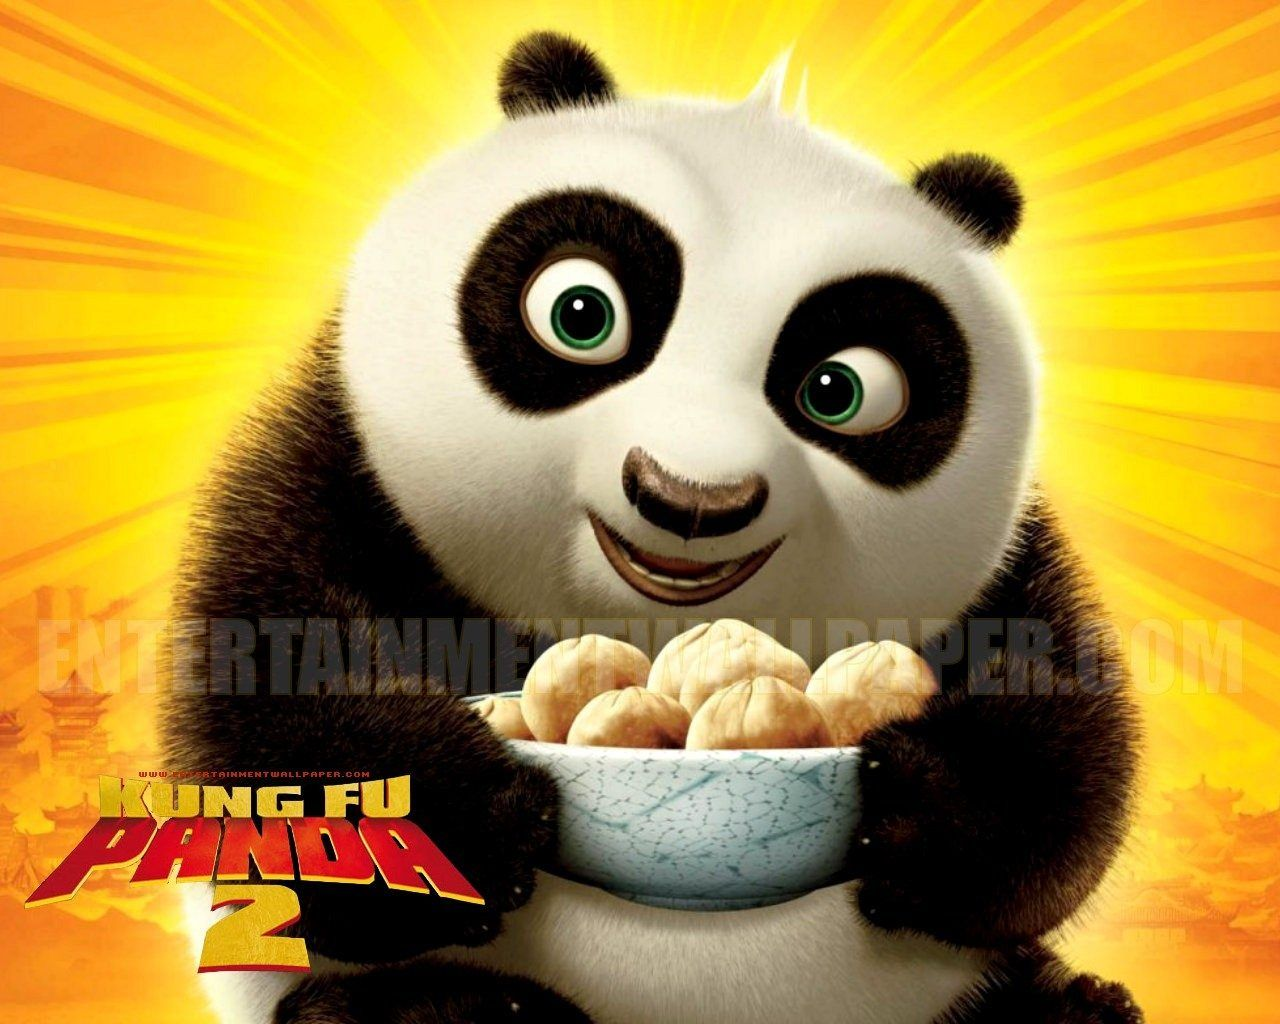 More Kung Fu Panda 2 Wallpaper On Page Prev 1 2 3 4 Next Kung Fu Panda Cartoon Wallpaper Panda